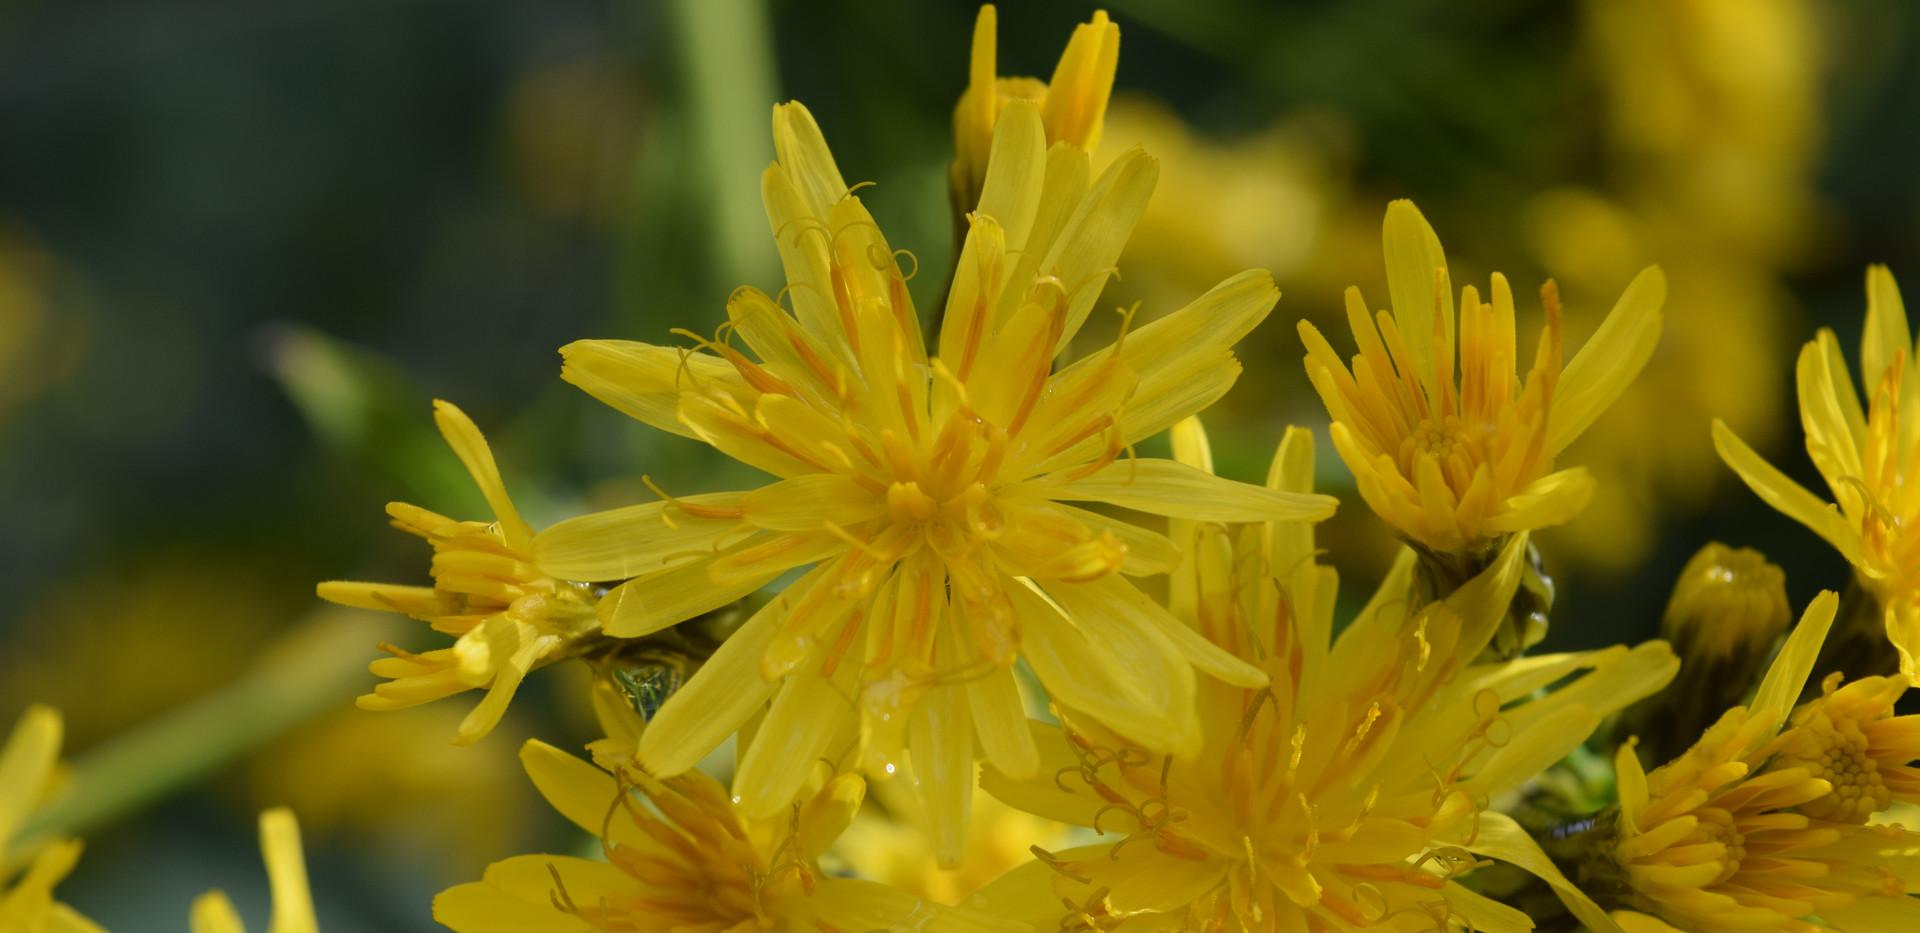 Sonchus palmensis